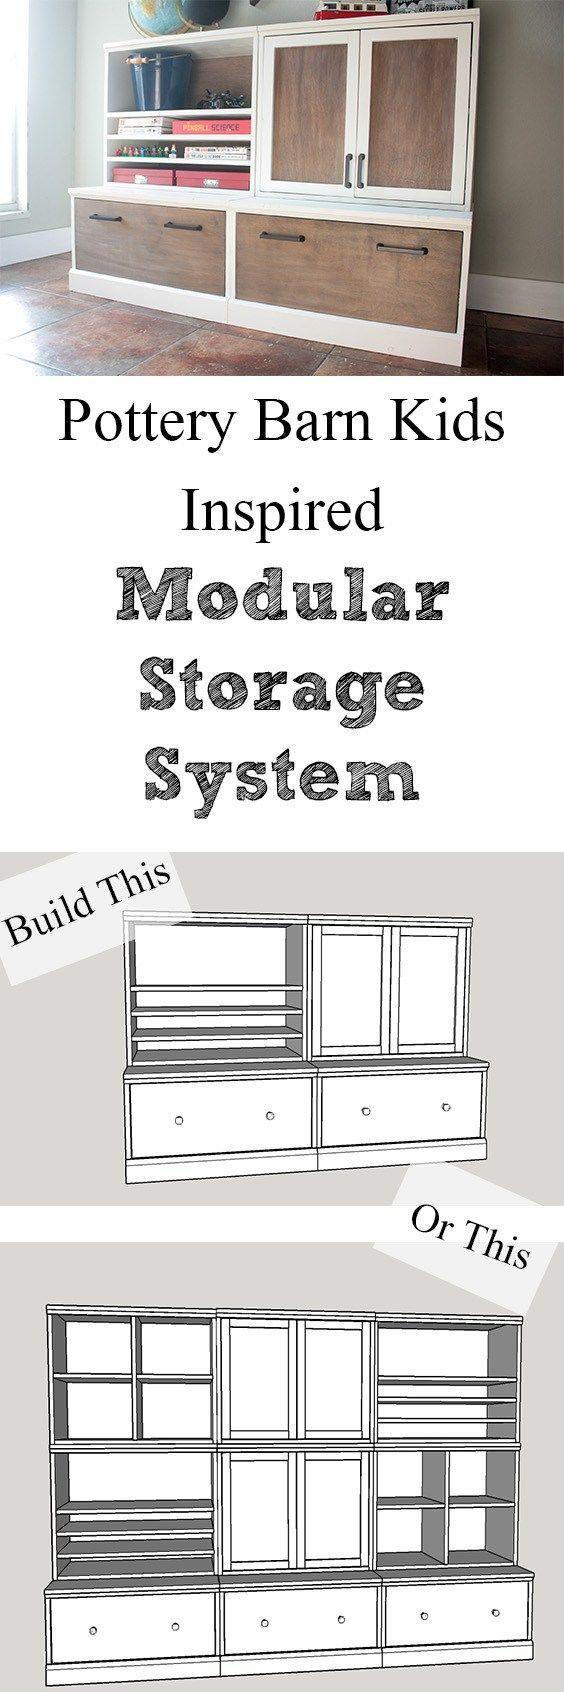 Pottery Barn Kids Inspired Modular Storage System